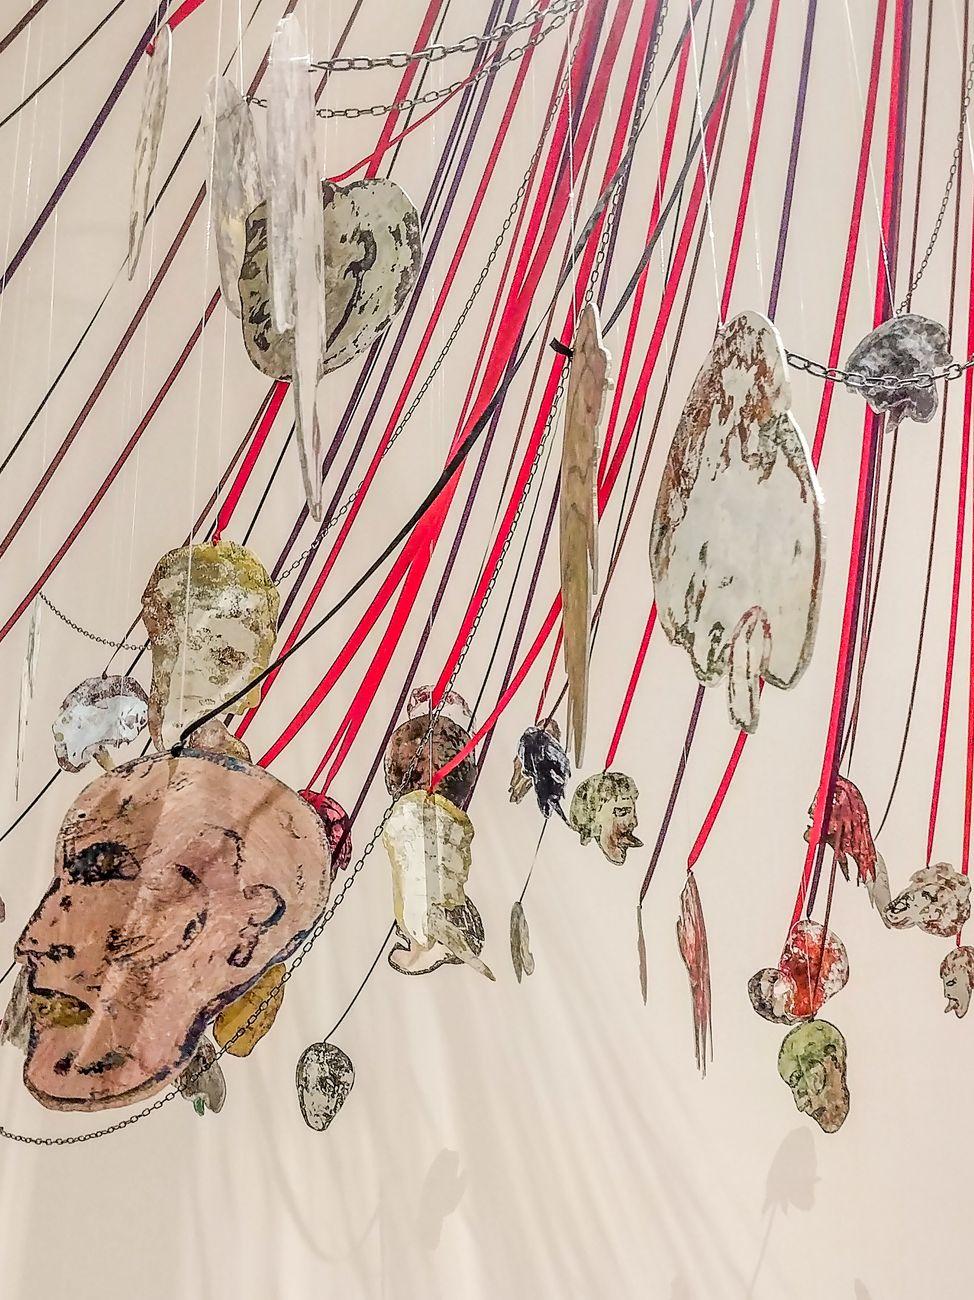 Nancy Spero, Maypole. Take No Prisoners, 2007, particolare. Installation view at MoMA PS1, New York 2019. Photo Maurita Cardone